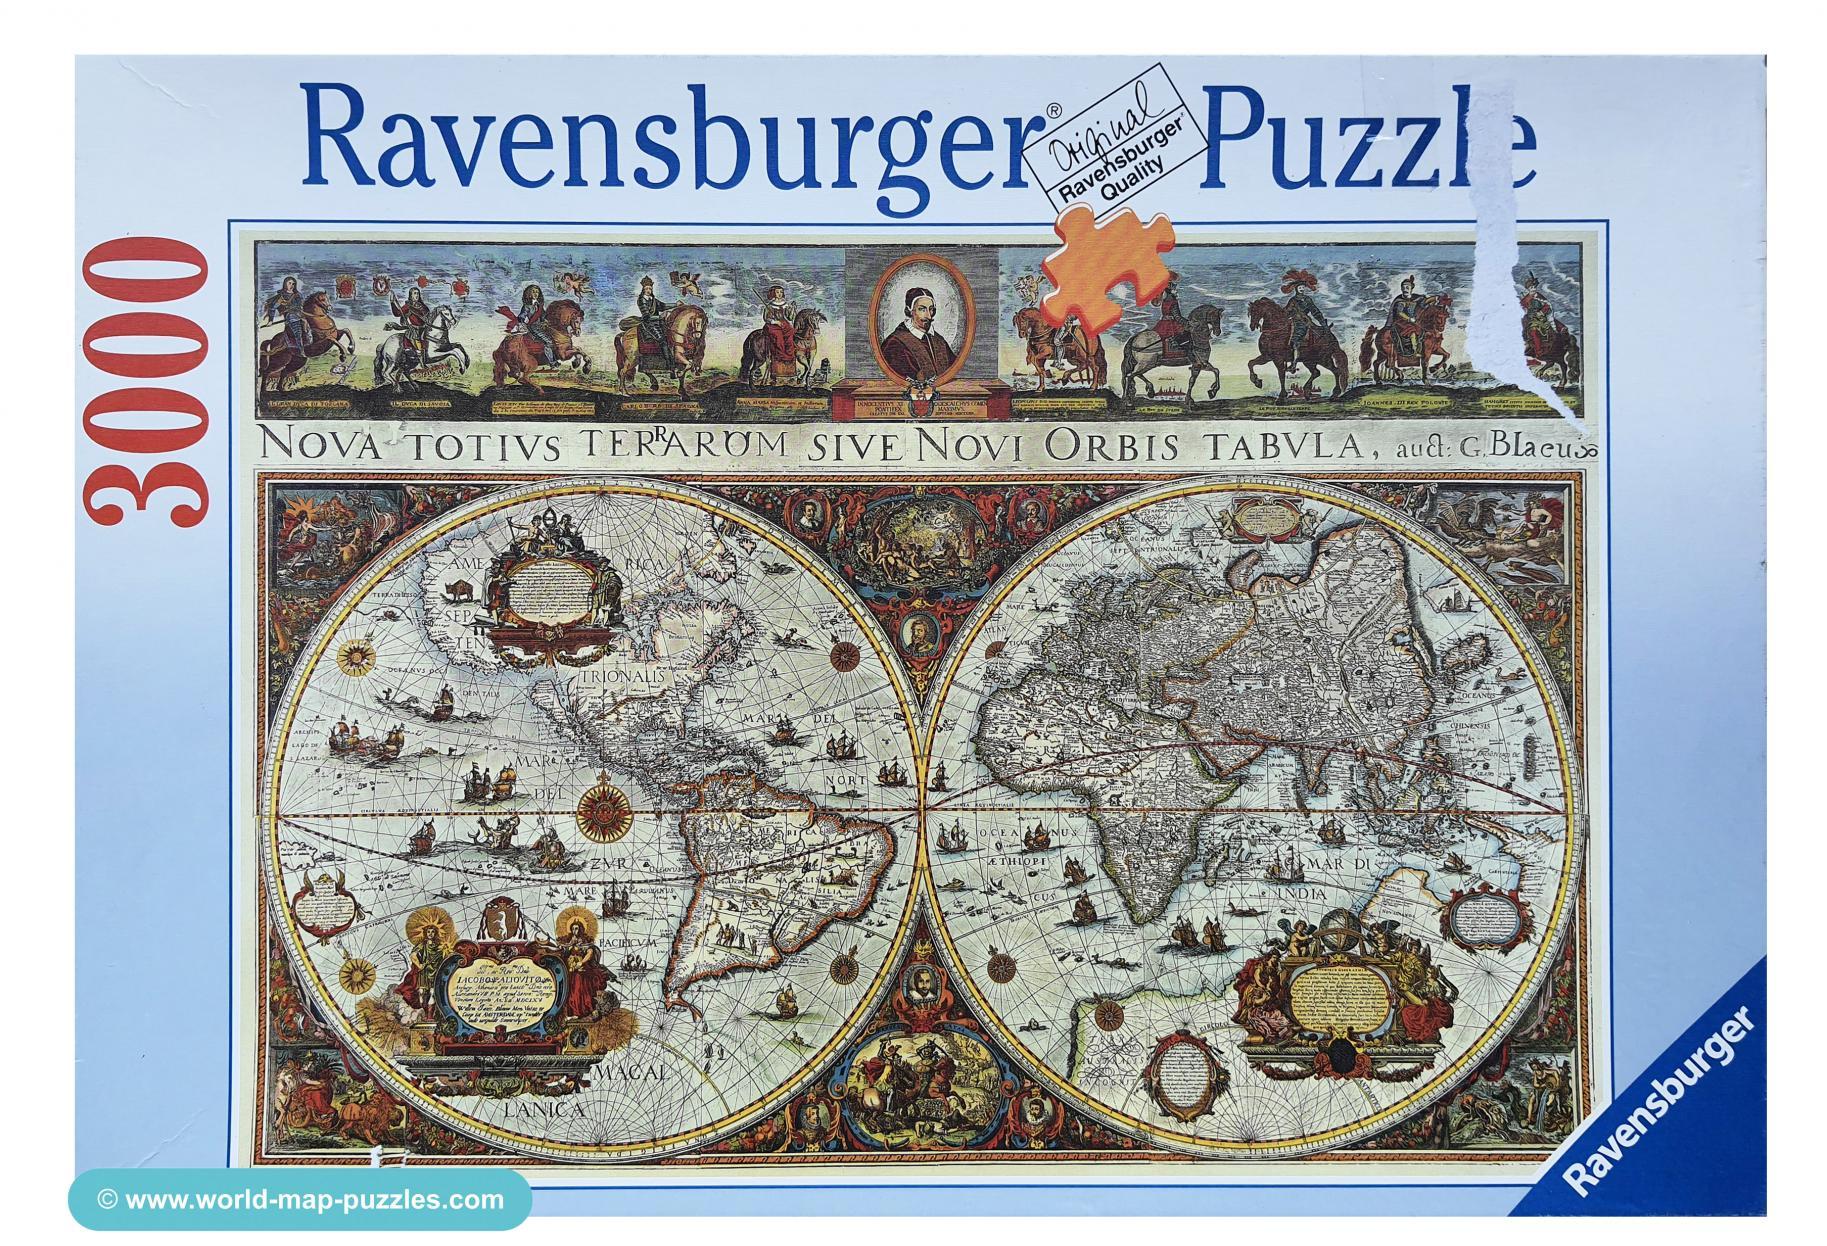 C mh-0032 Ravensburger 3000